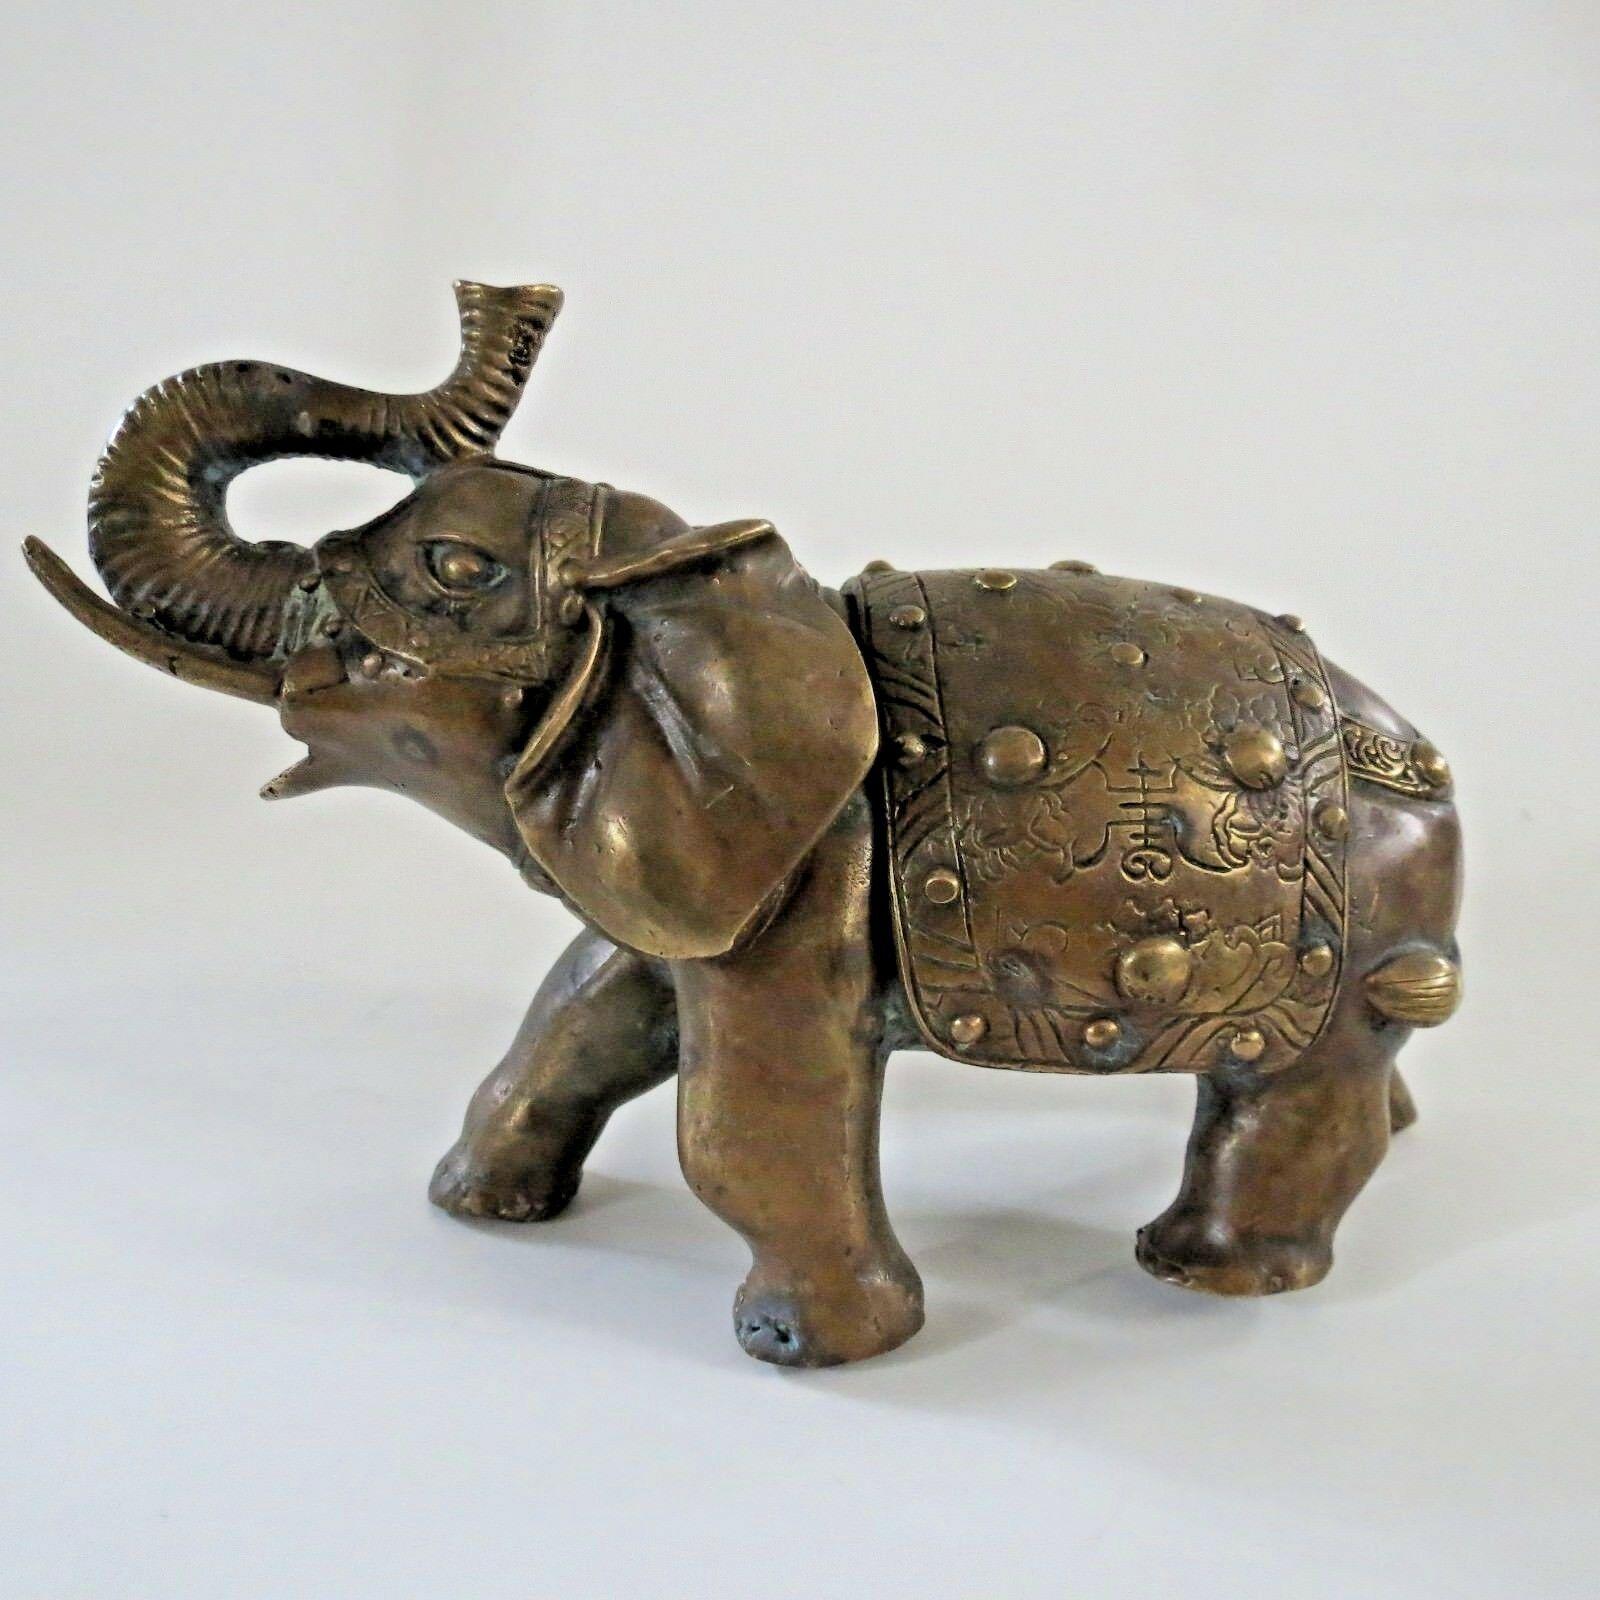 Bronze antique elephant figurine India Chinese 1890 Art Nouveau Divinity figure